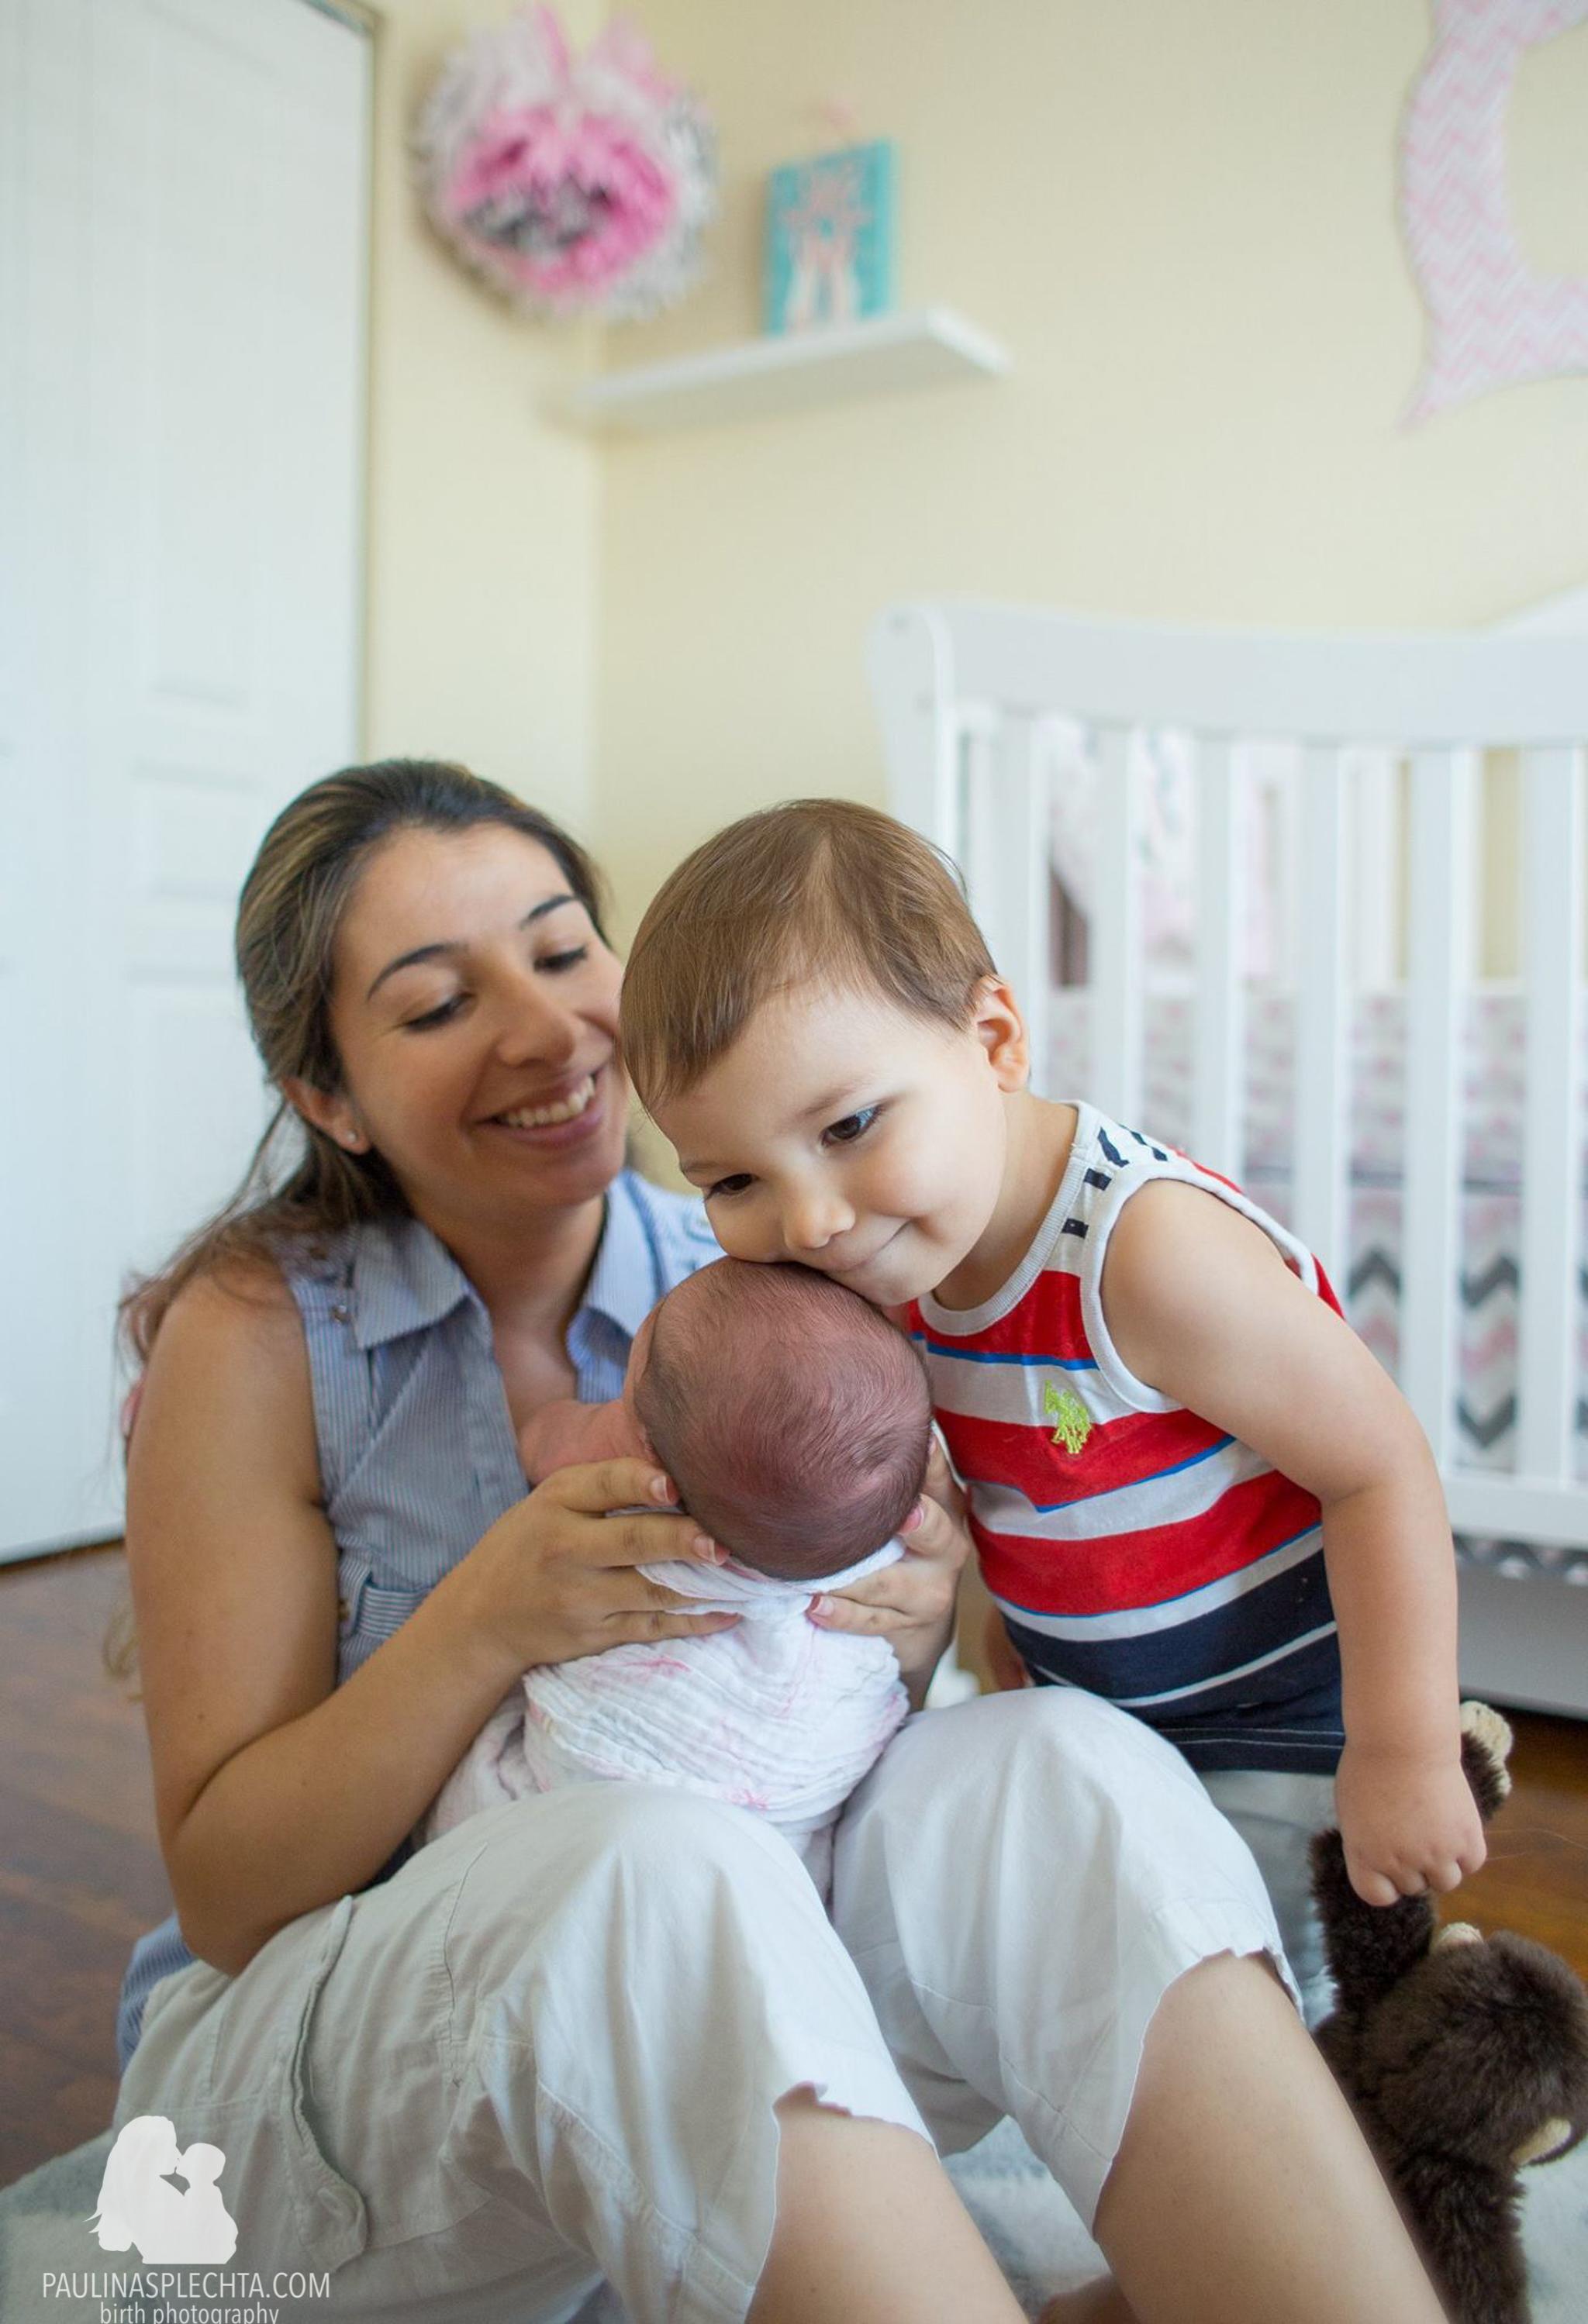 vbac-2vbac-birthwithoutfear-birthphotographer-midwife-womensmidwifery-christinehackshaw-kathyfair-22.jpg